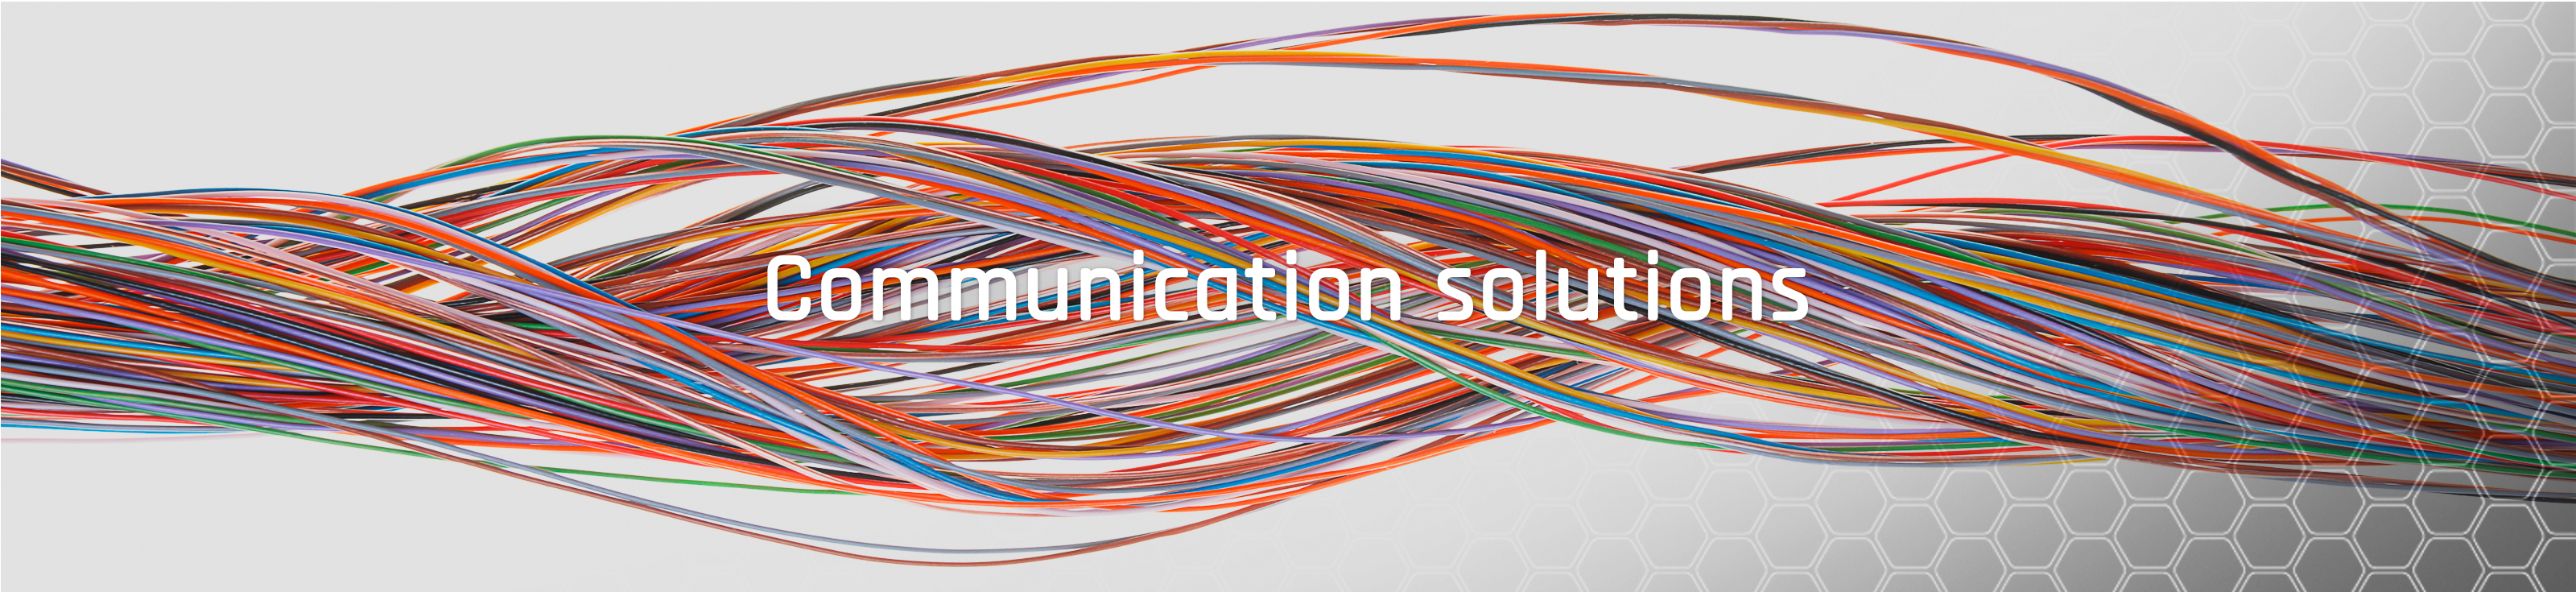 Slider_communication_solutions_ps